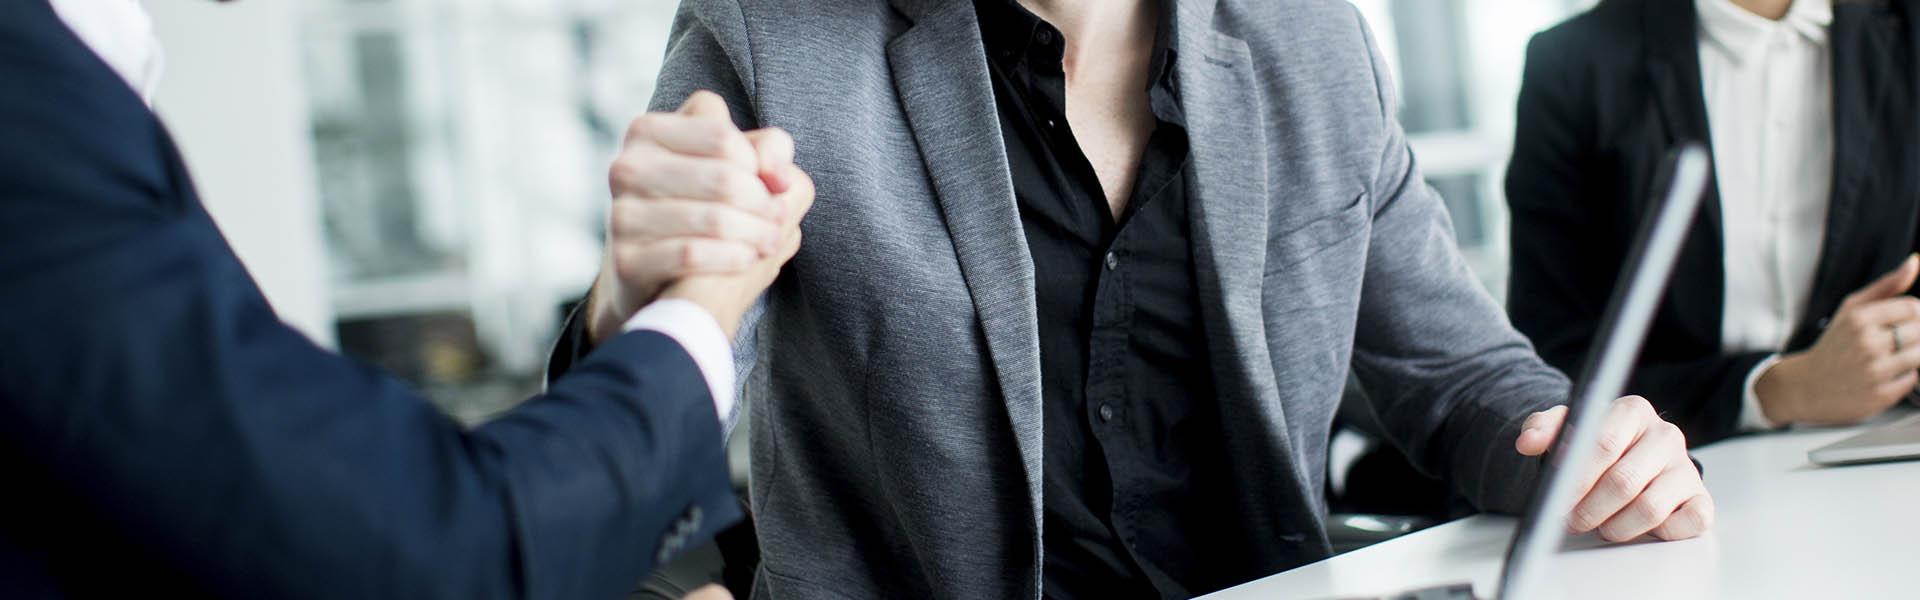 promos partner sistemi crescita competenza trasparenza